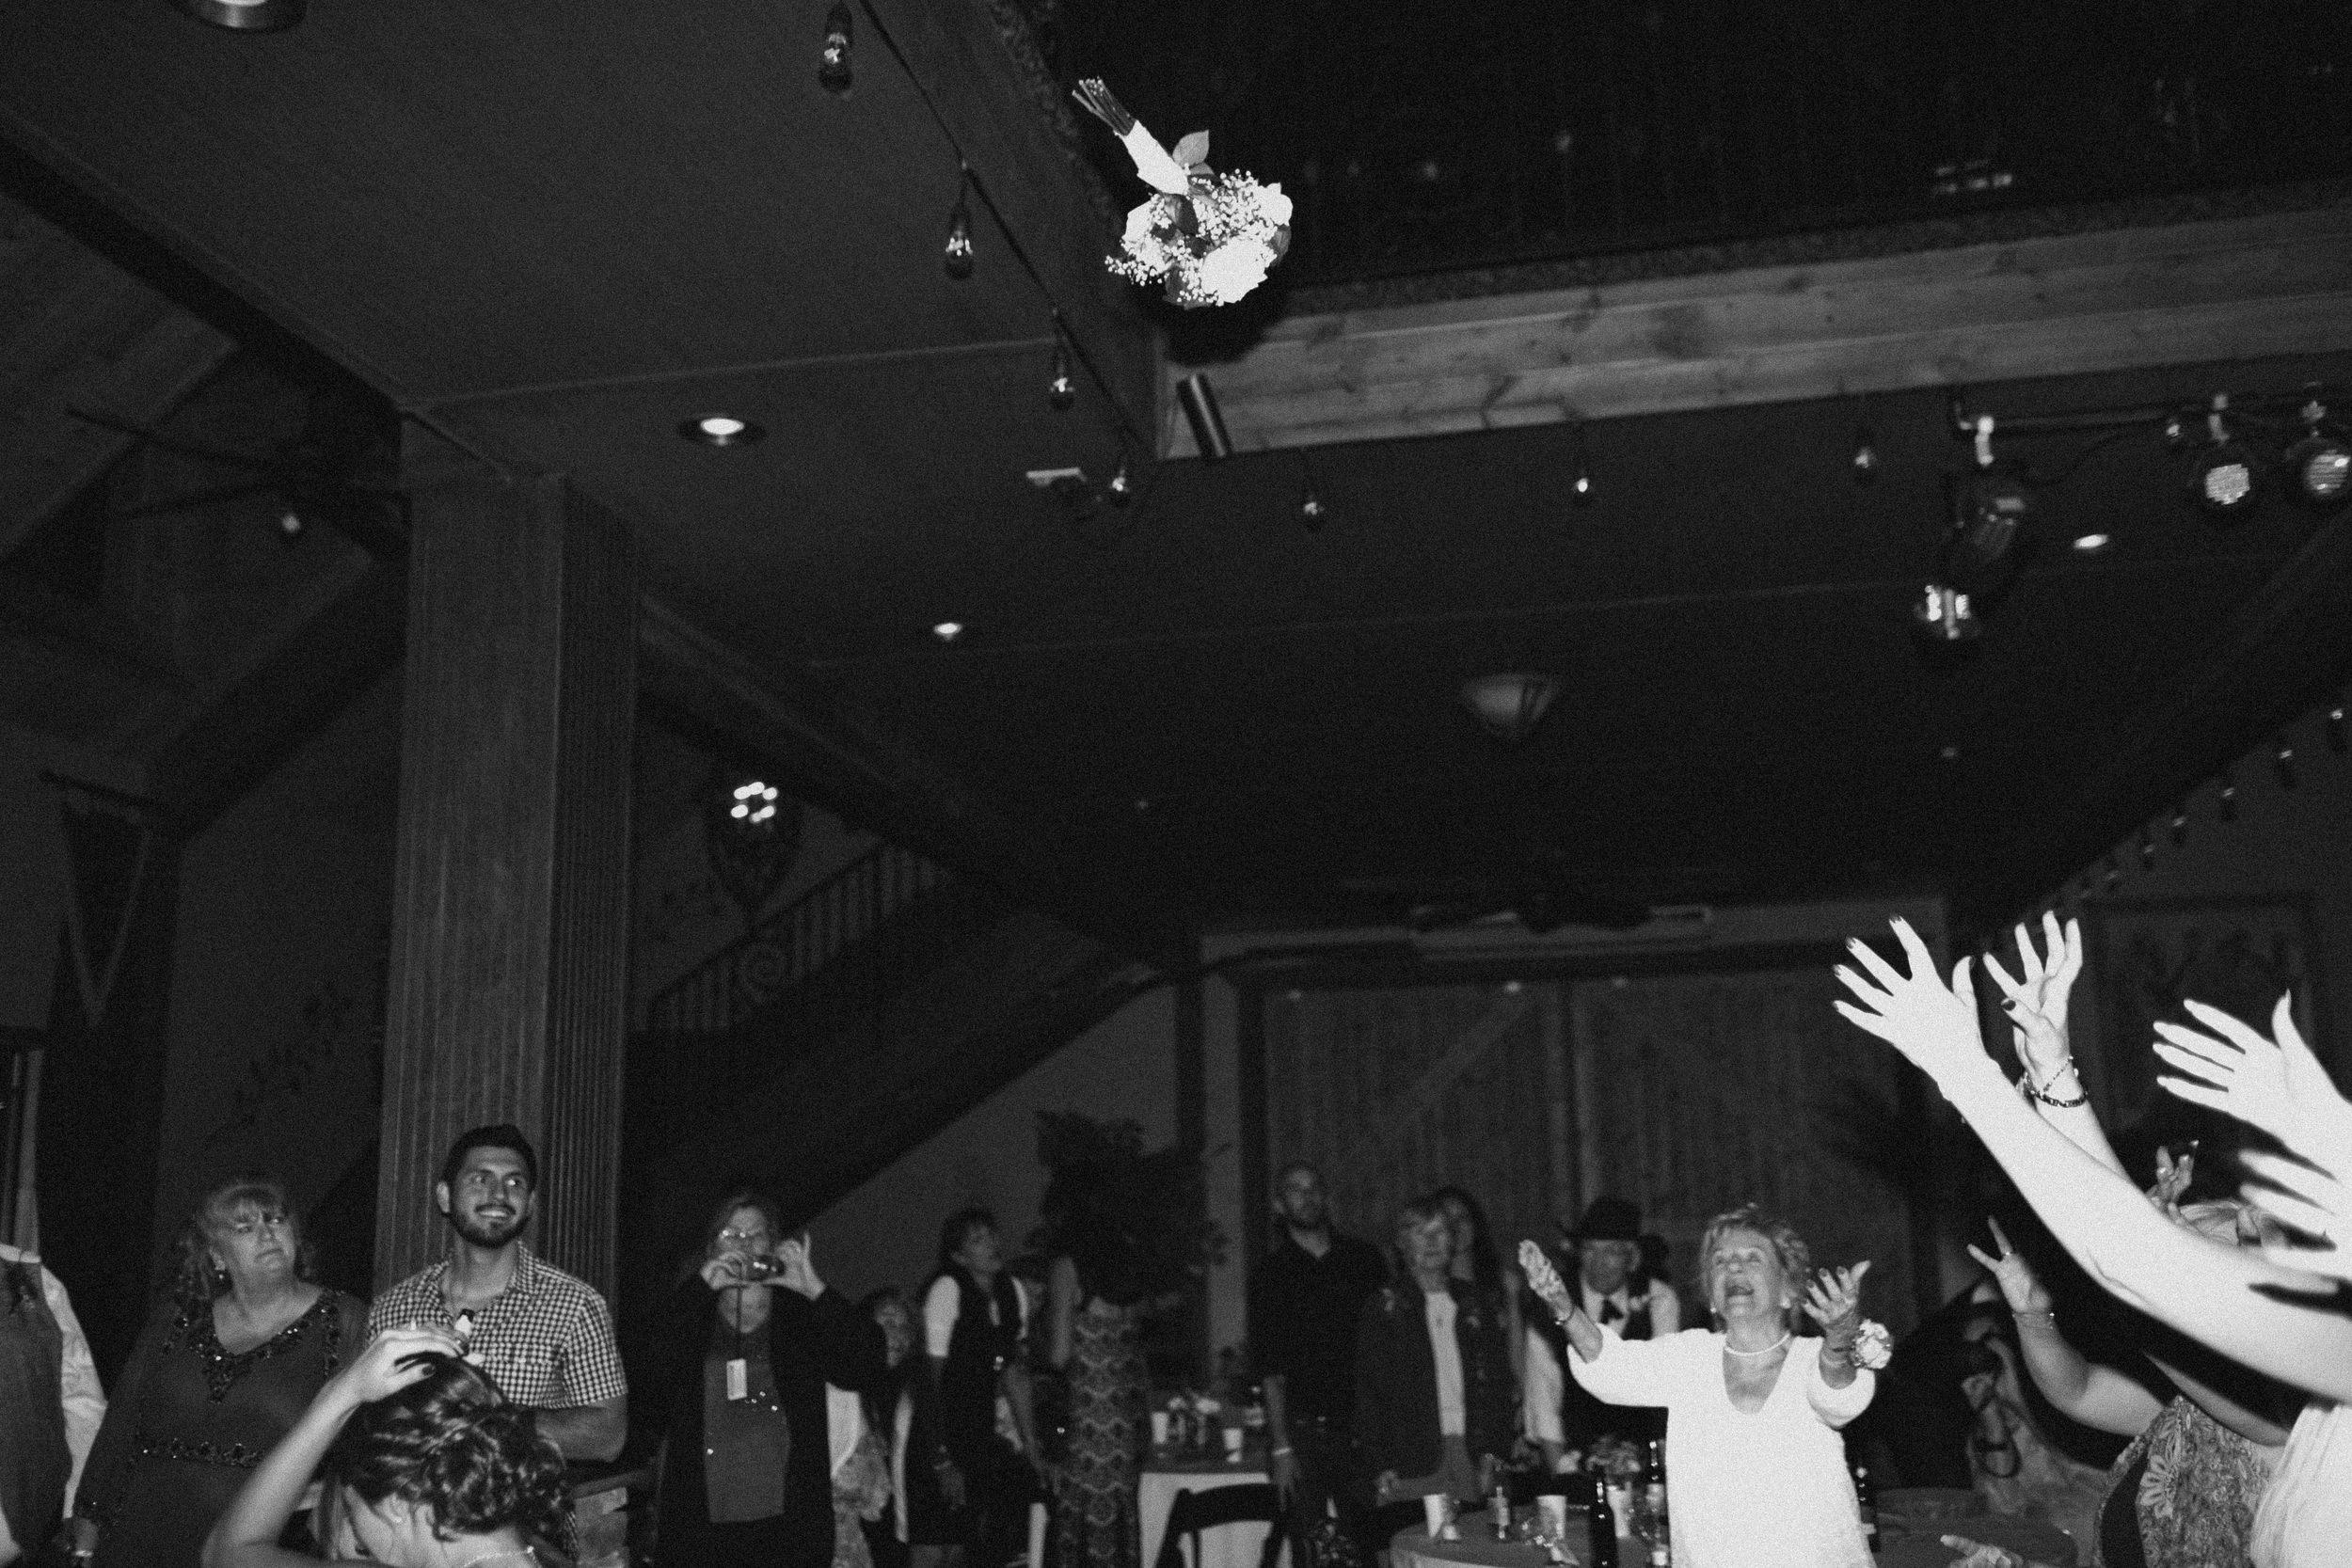 Cheyenne + Jordan - Wedding, Natalie Griffo (129 of 157).jpg